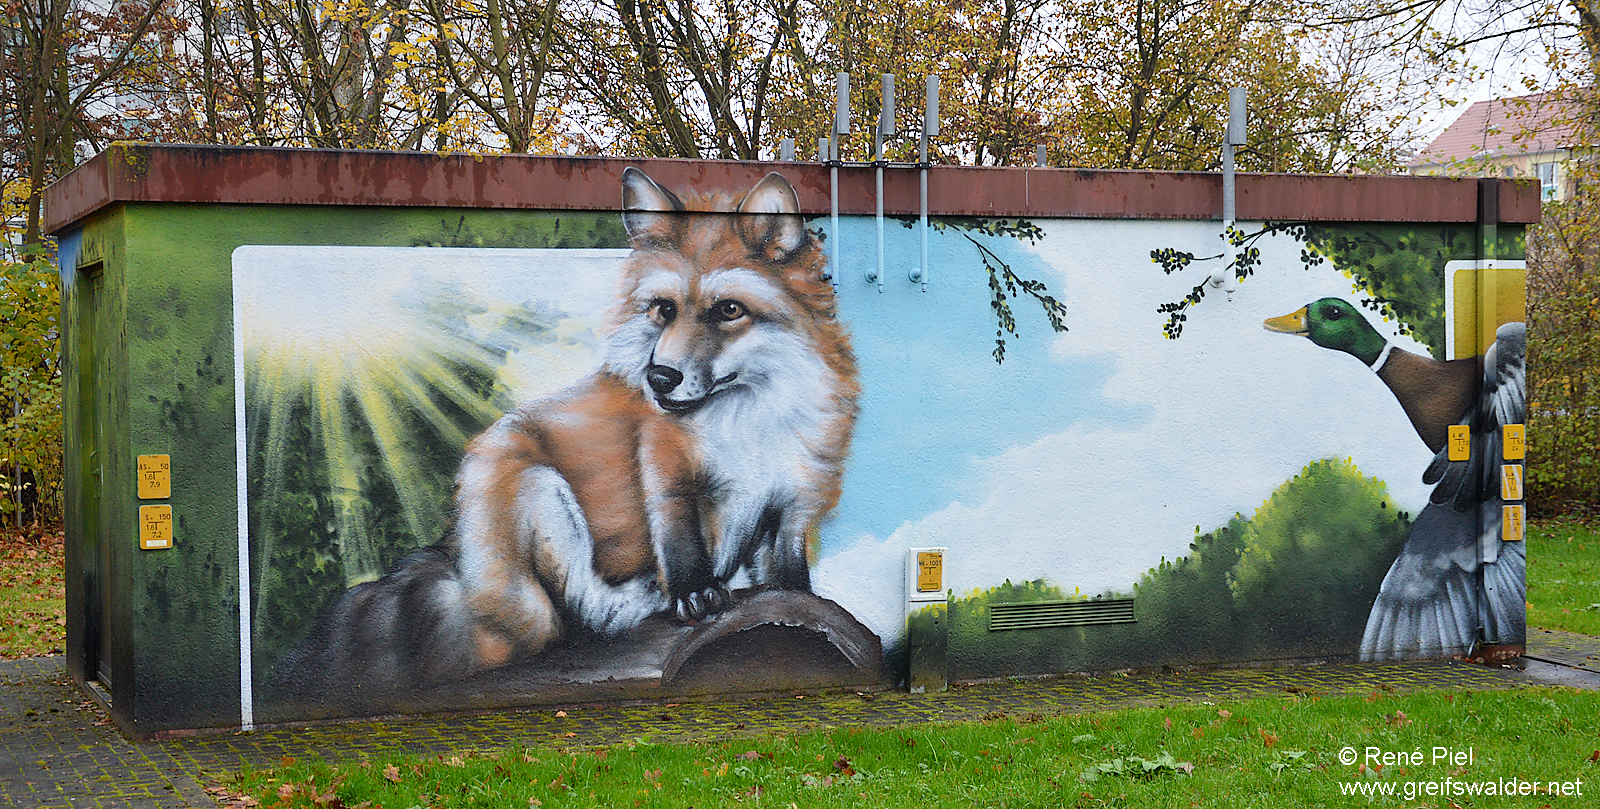 Graffiti in Greifswald